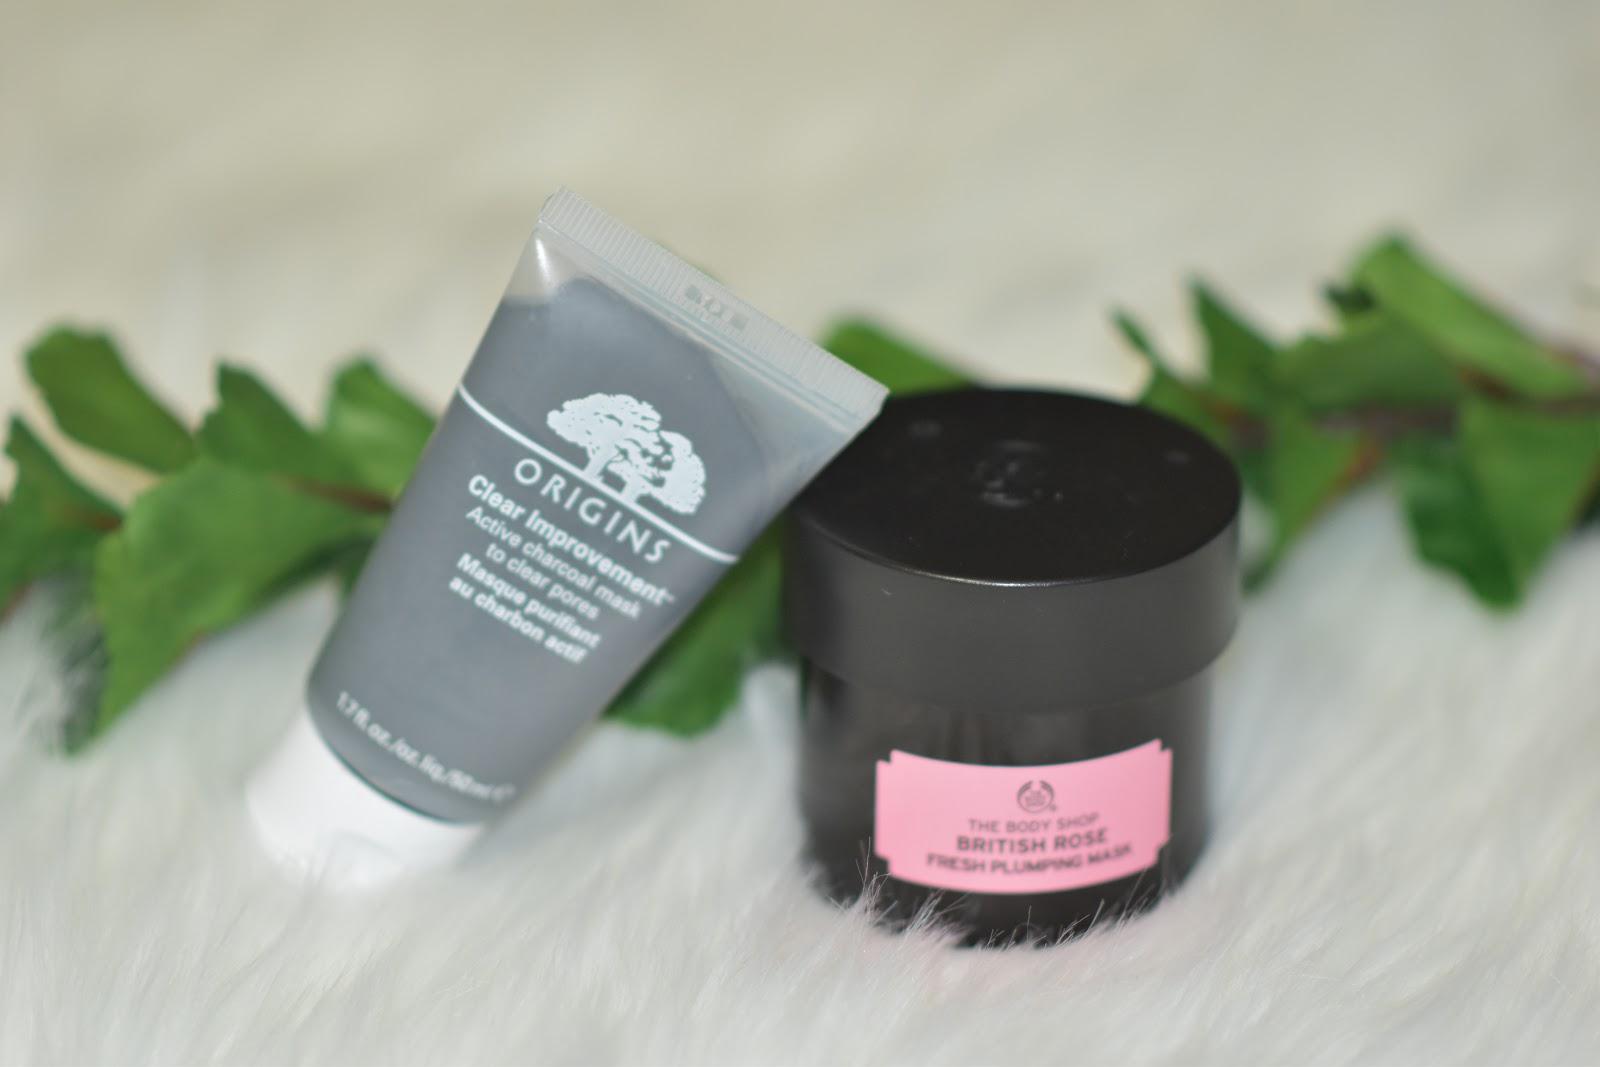 Origins Clear Improvement_The Body Shop British Rose Mask_AimforGlam